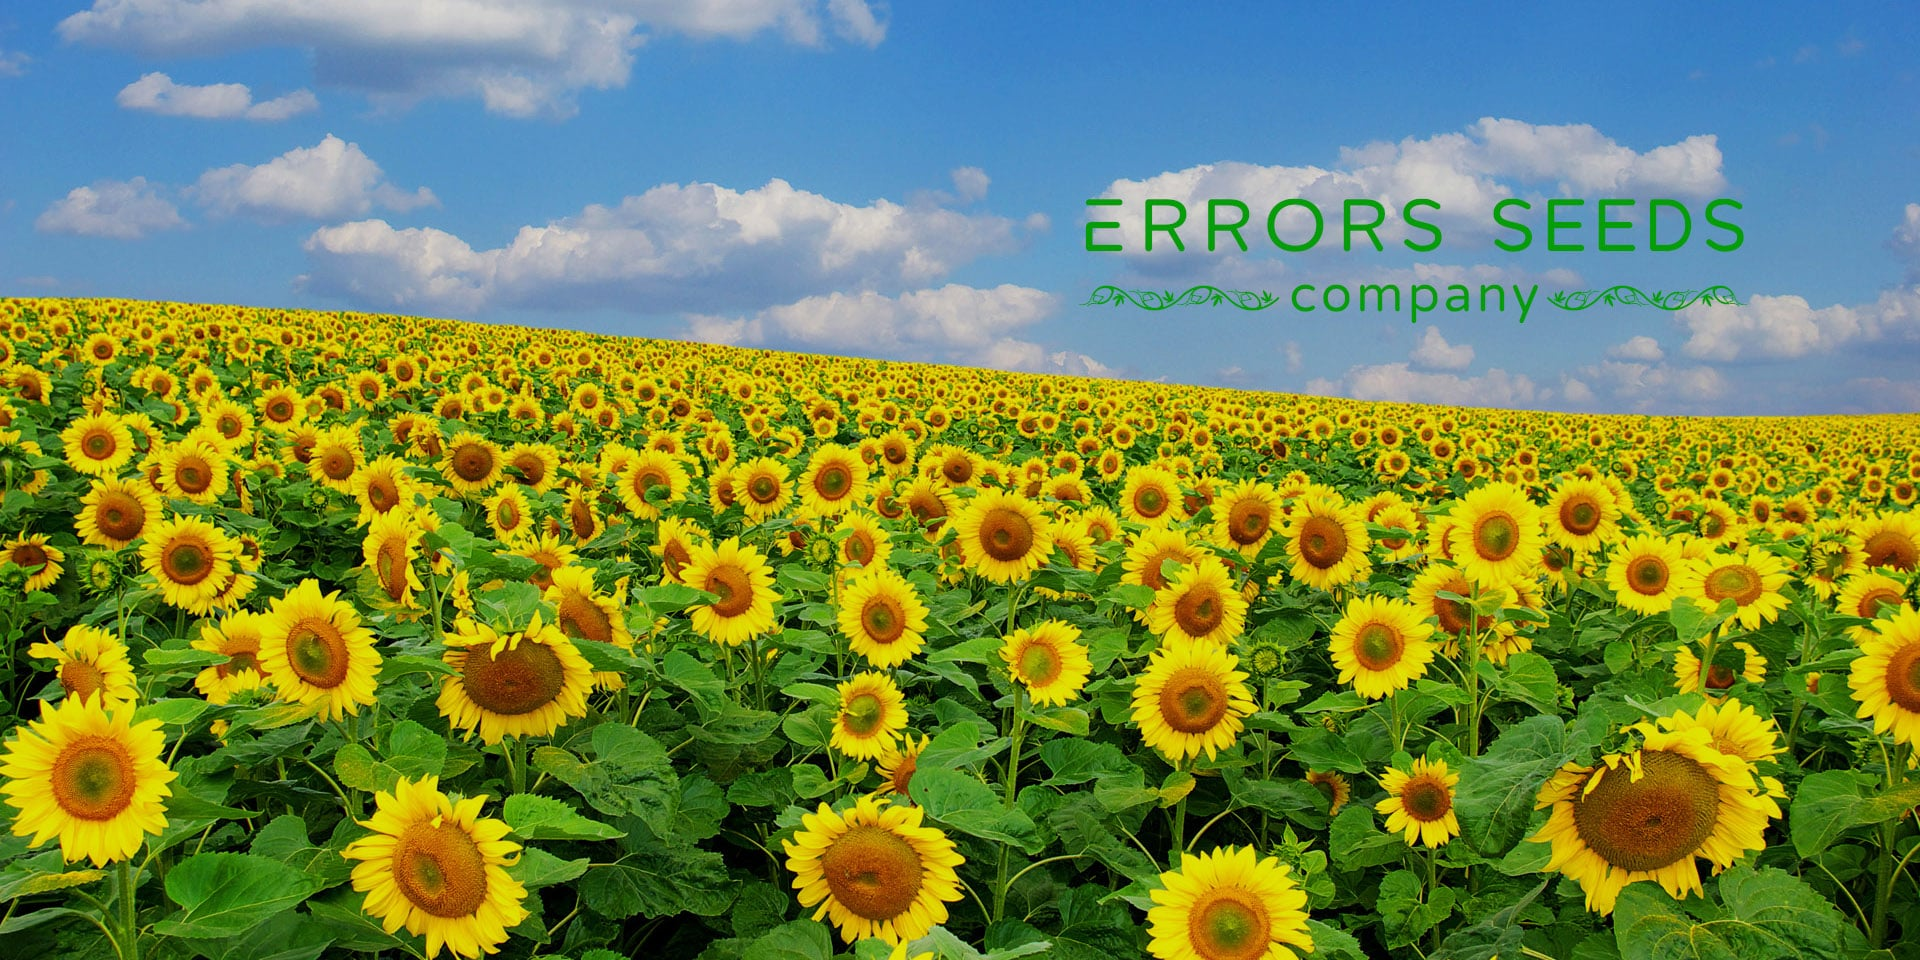 ERRORS-SEEDS